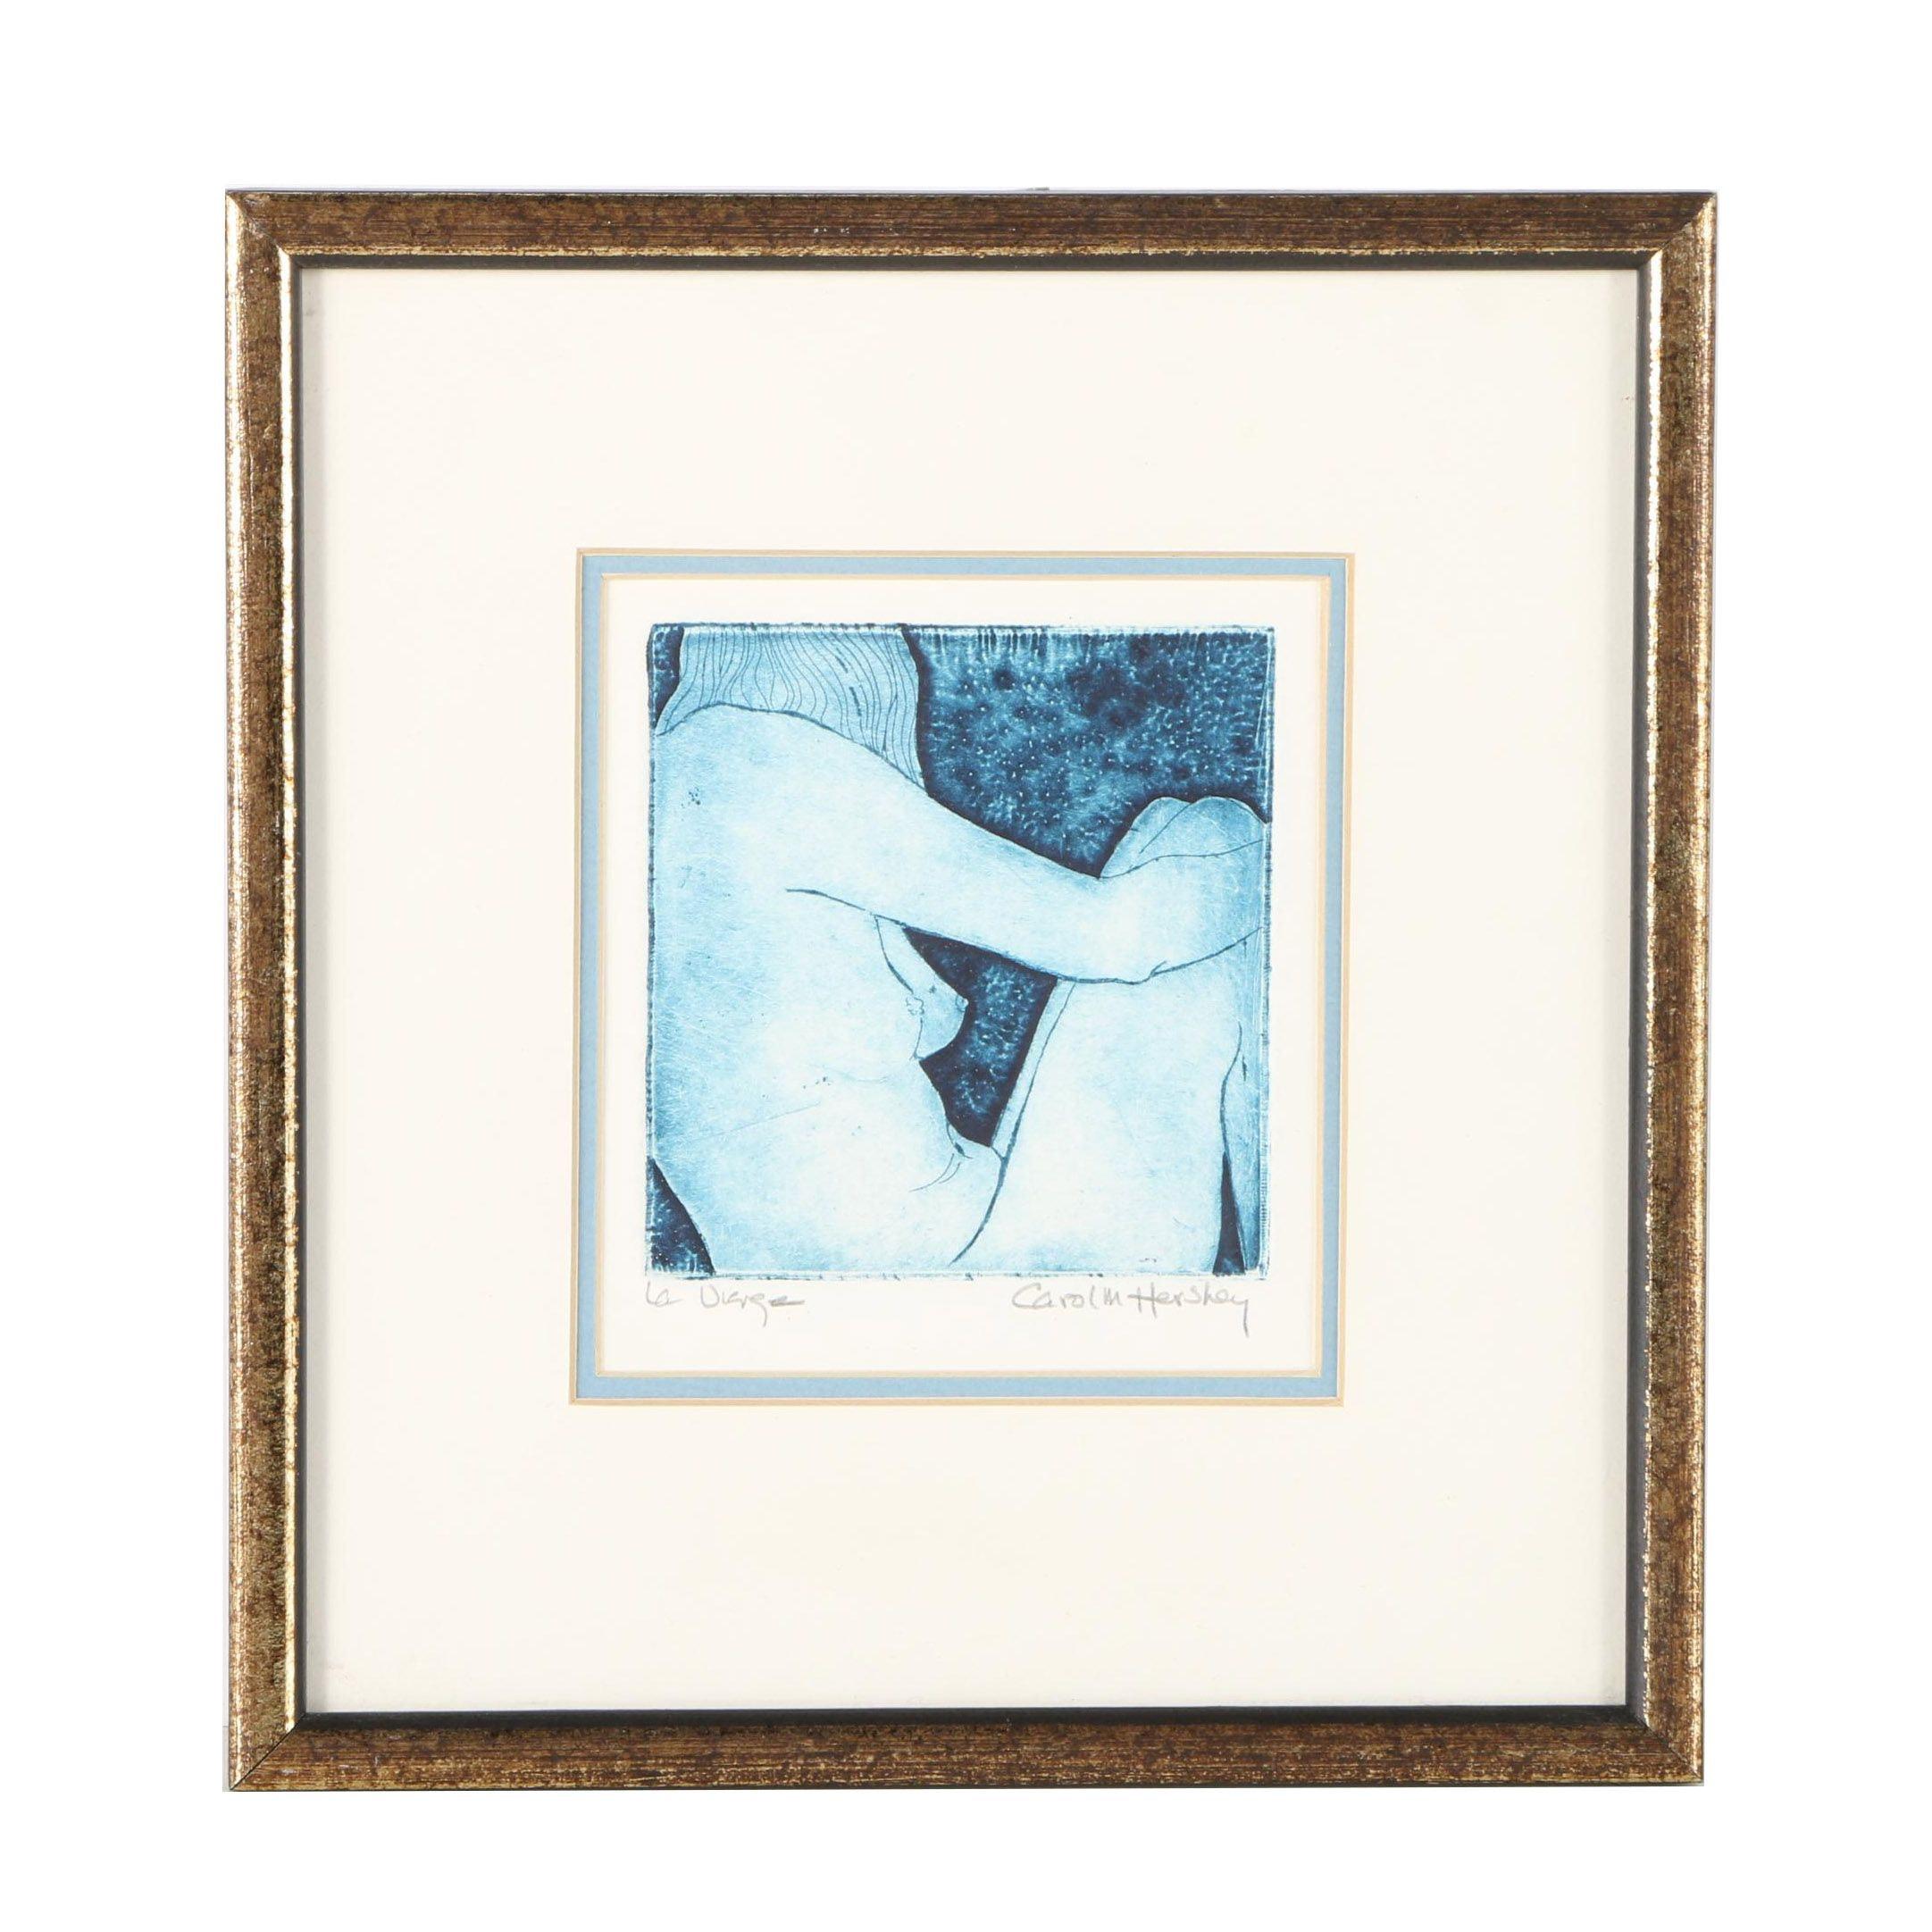 Carol M. Hershey Etching of a Female Nude